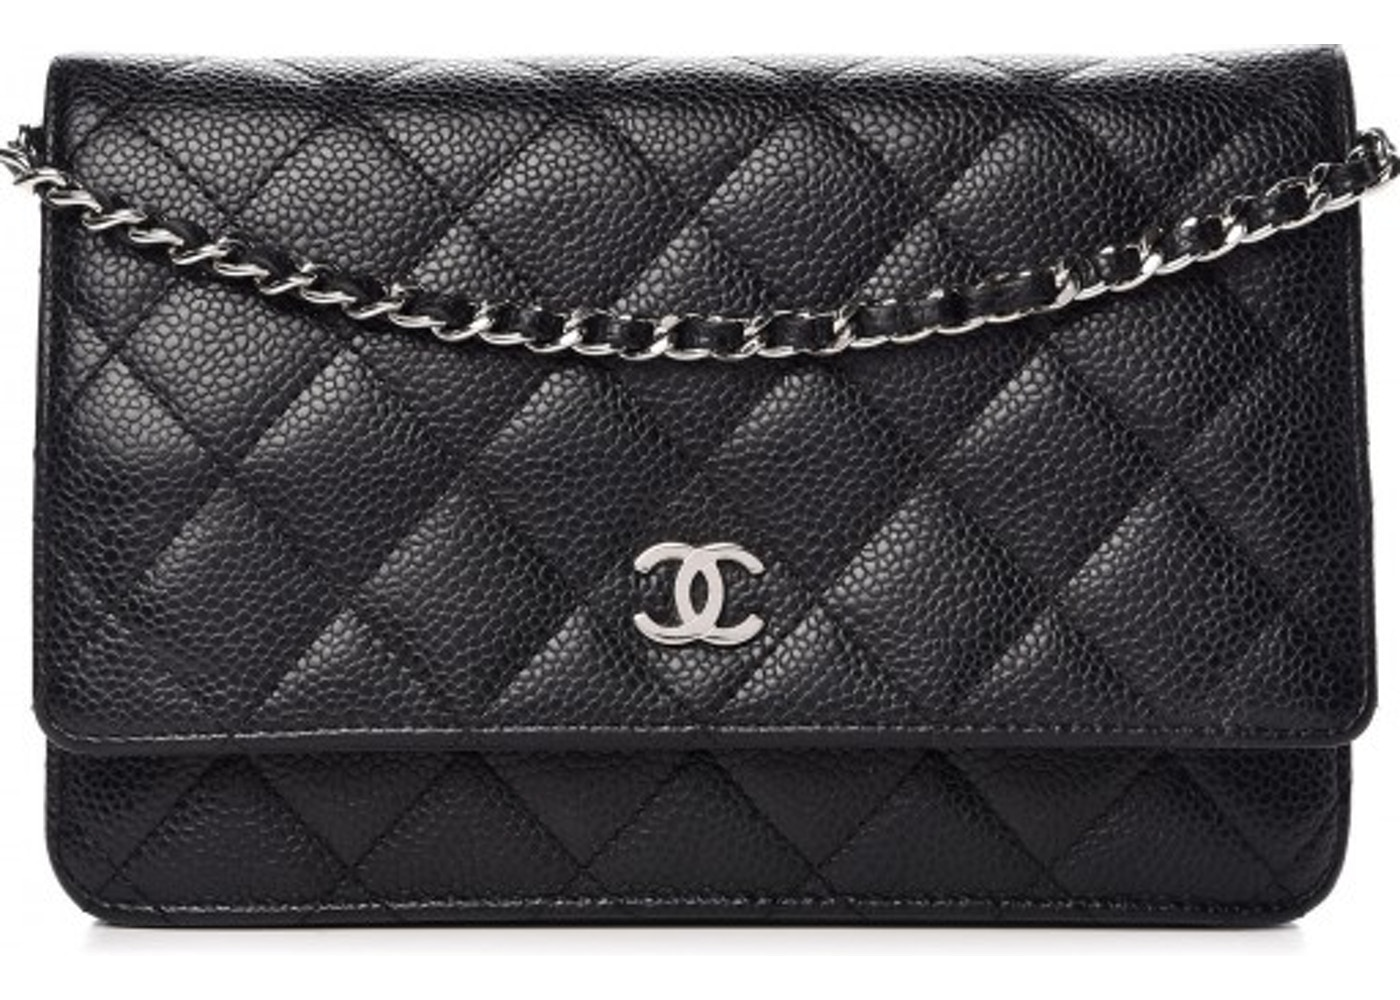 d6e6f2dcb024 Buy & Sell Chanel WOC Handbags - New Highest Bids